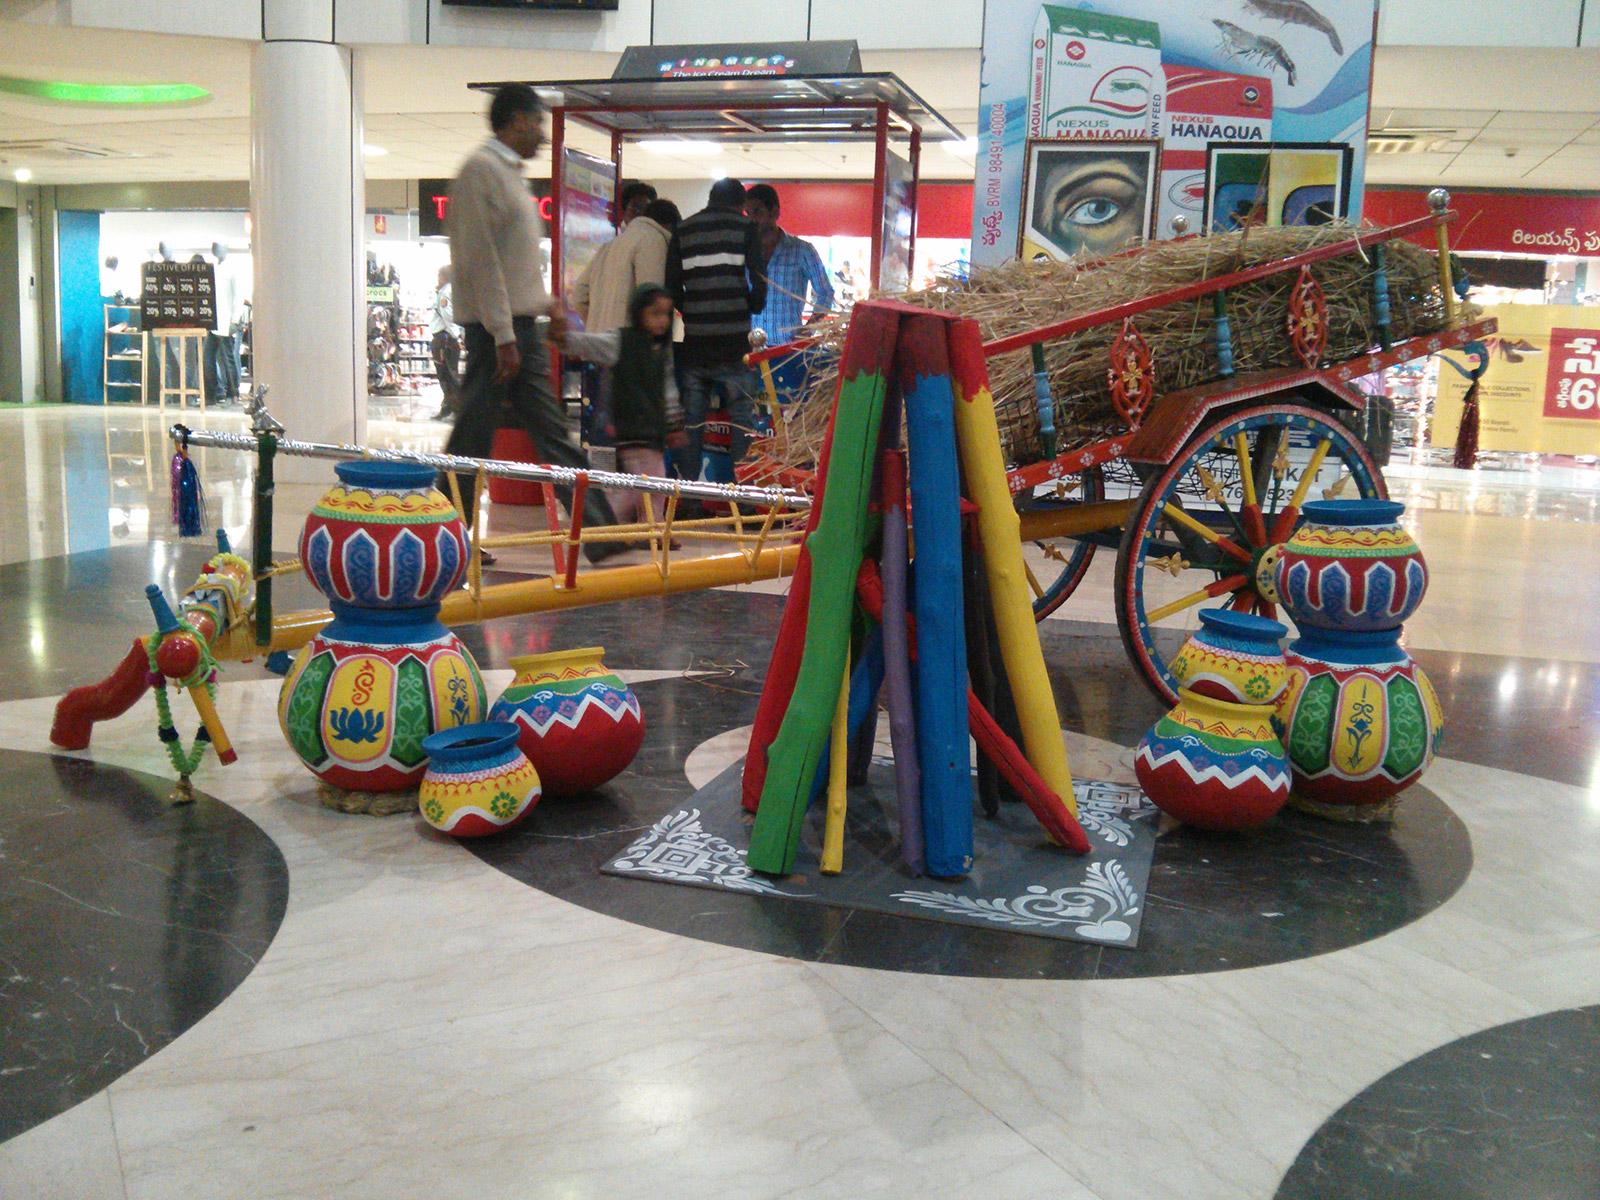 Sankranthi Event @ Coastal City Center, Bhimavaram - Events & Shopping in Bhimavaram